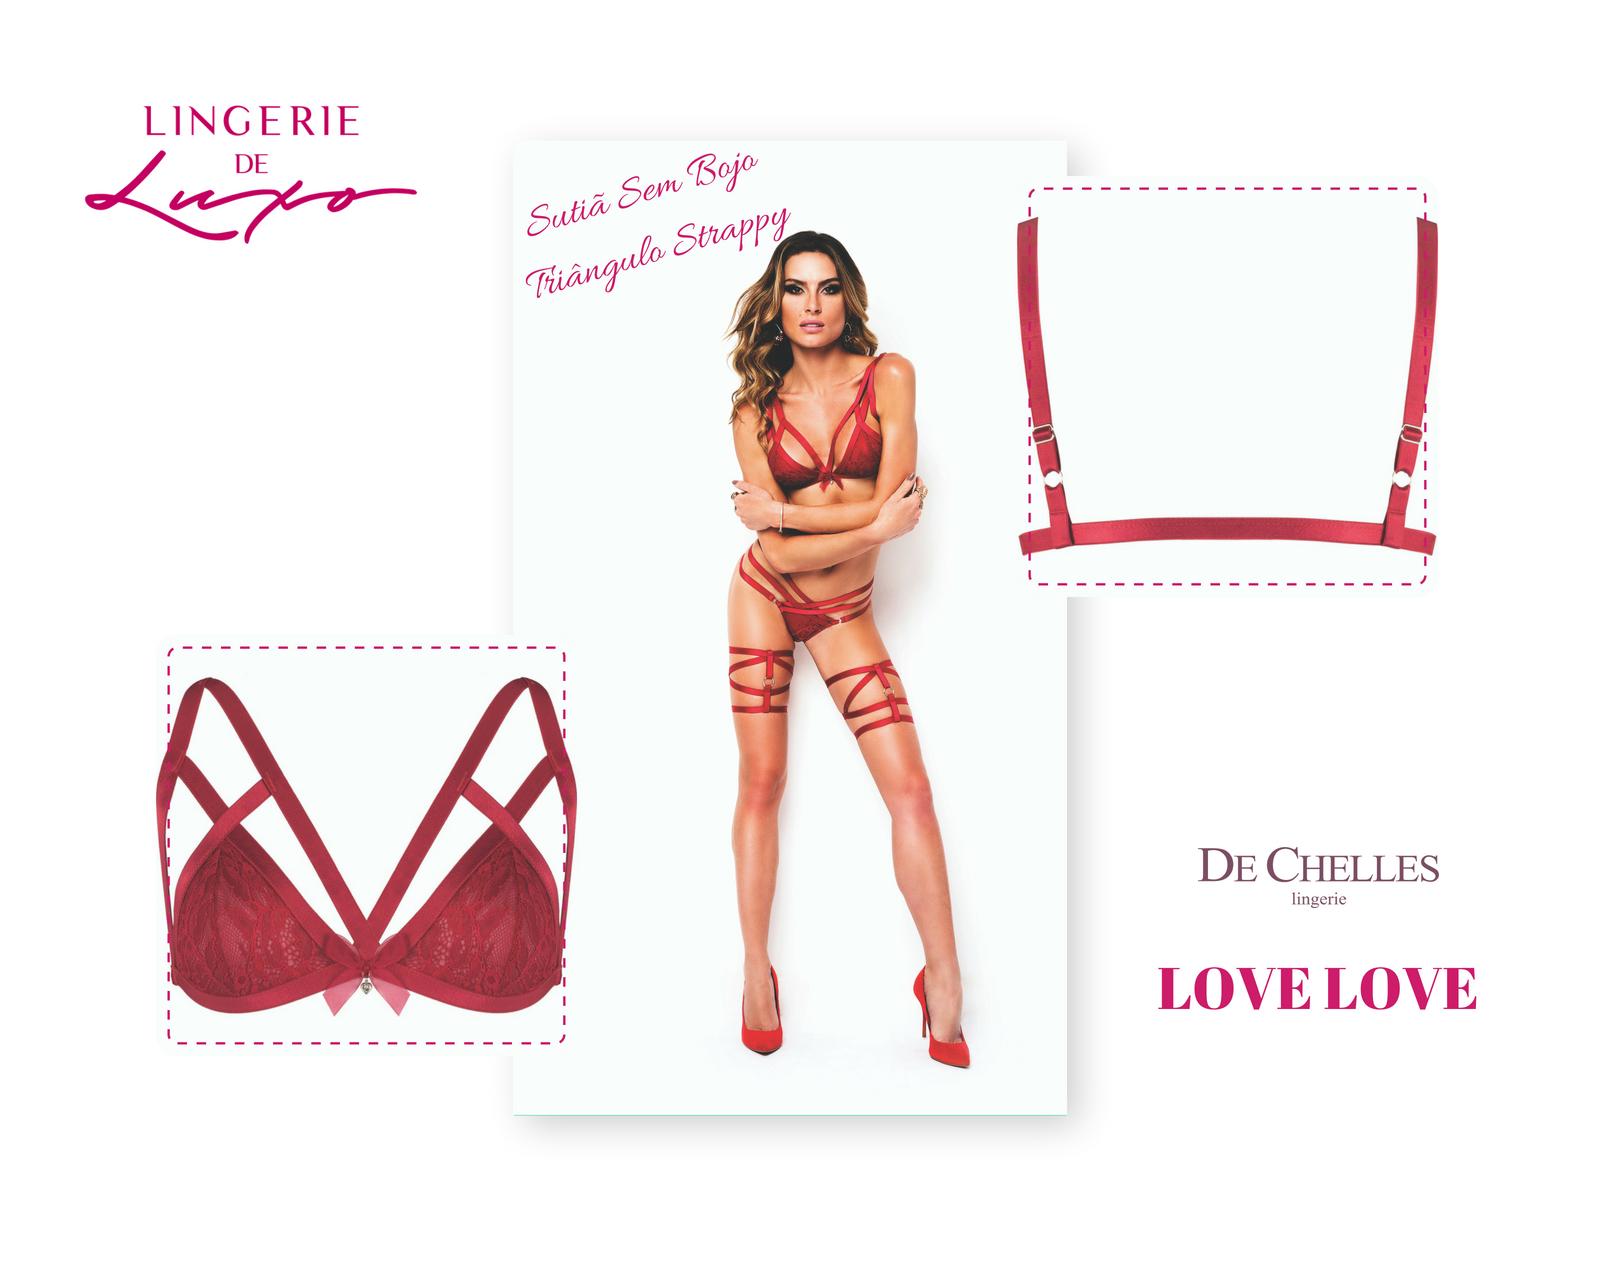 d40dabdc1 Sutiã Sem Bojo Triângulo Strappy Love Love - Lingerie de Luxo